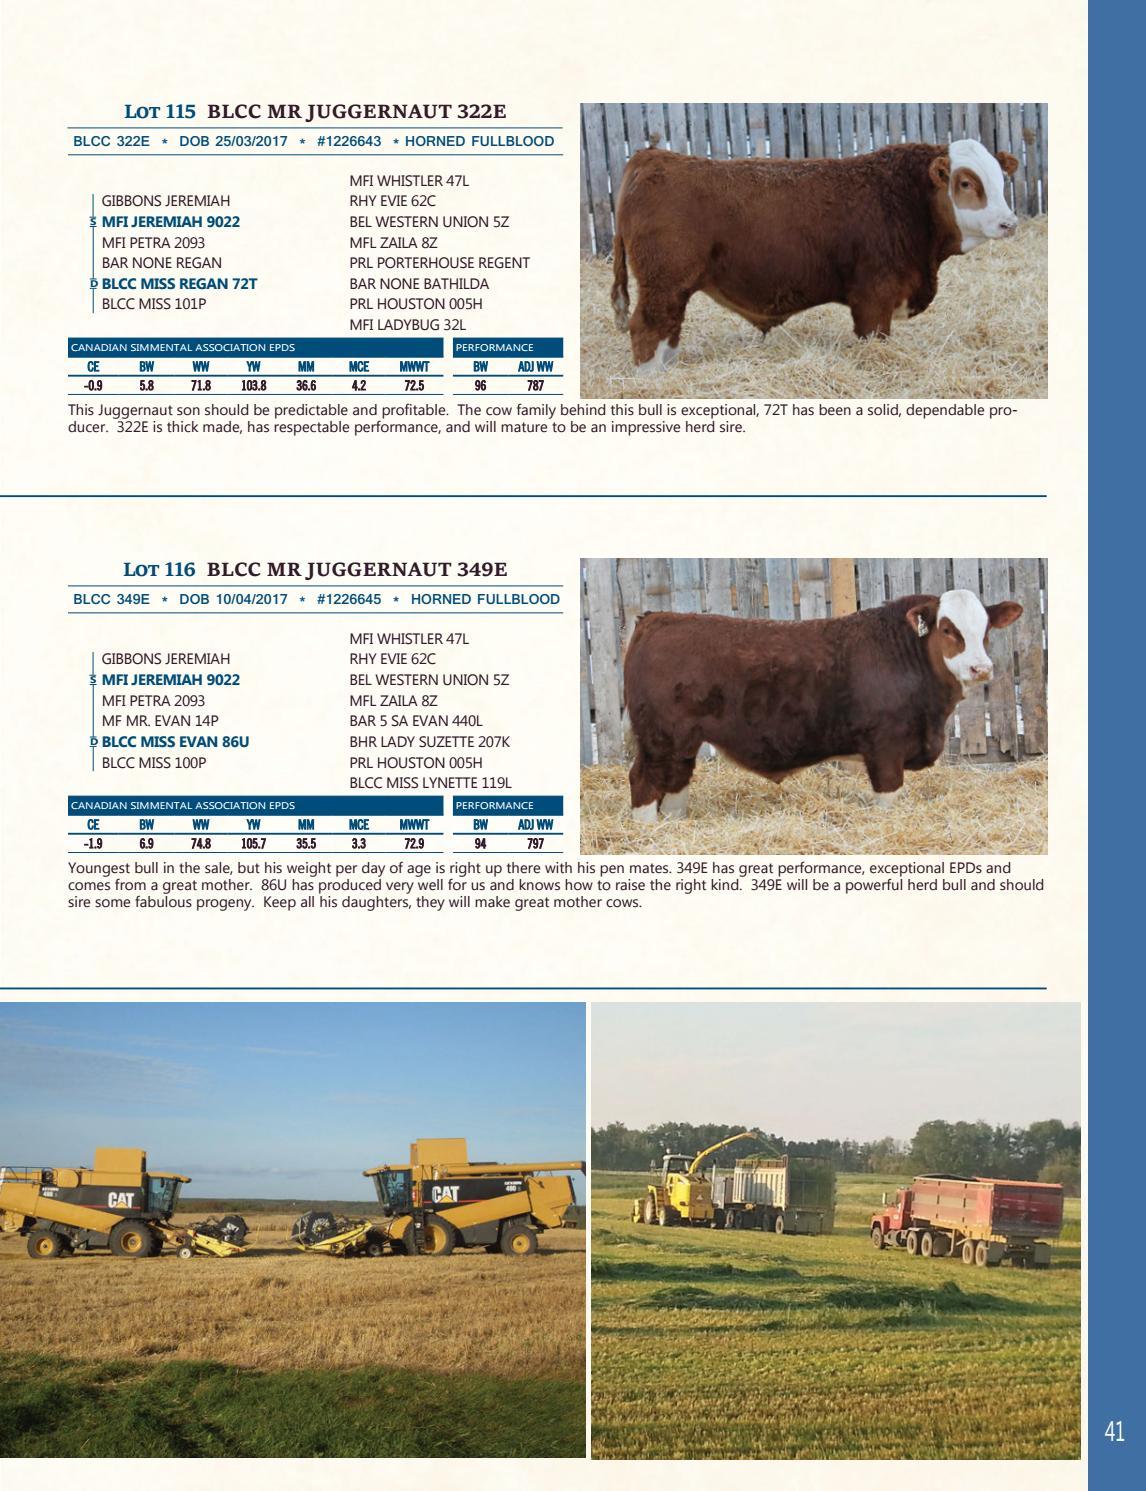 Bonchuk Farms 18th Annual Bull Sale by Bouchard Livestock